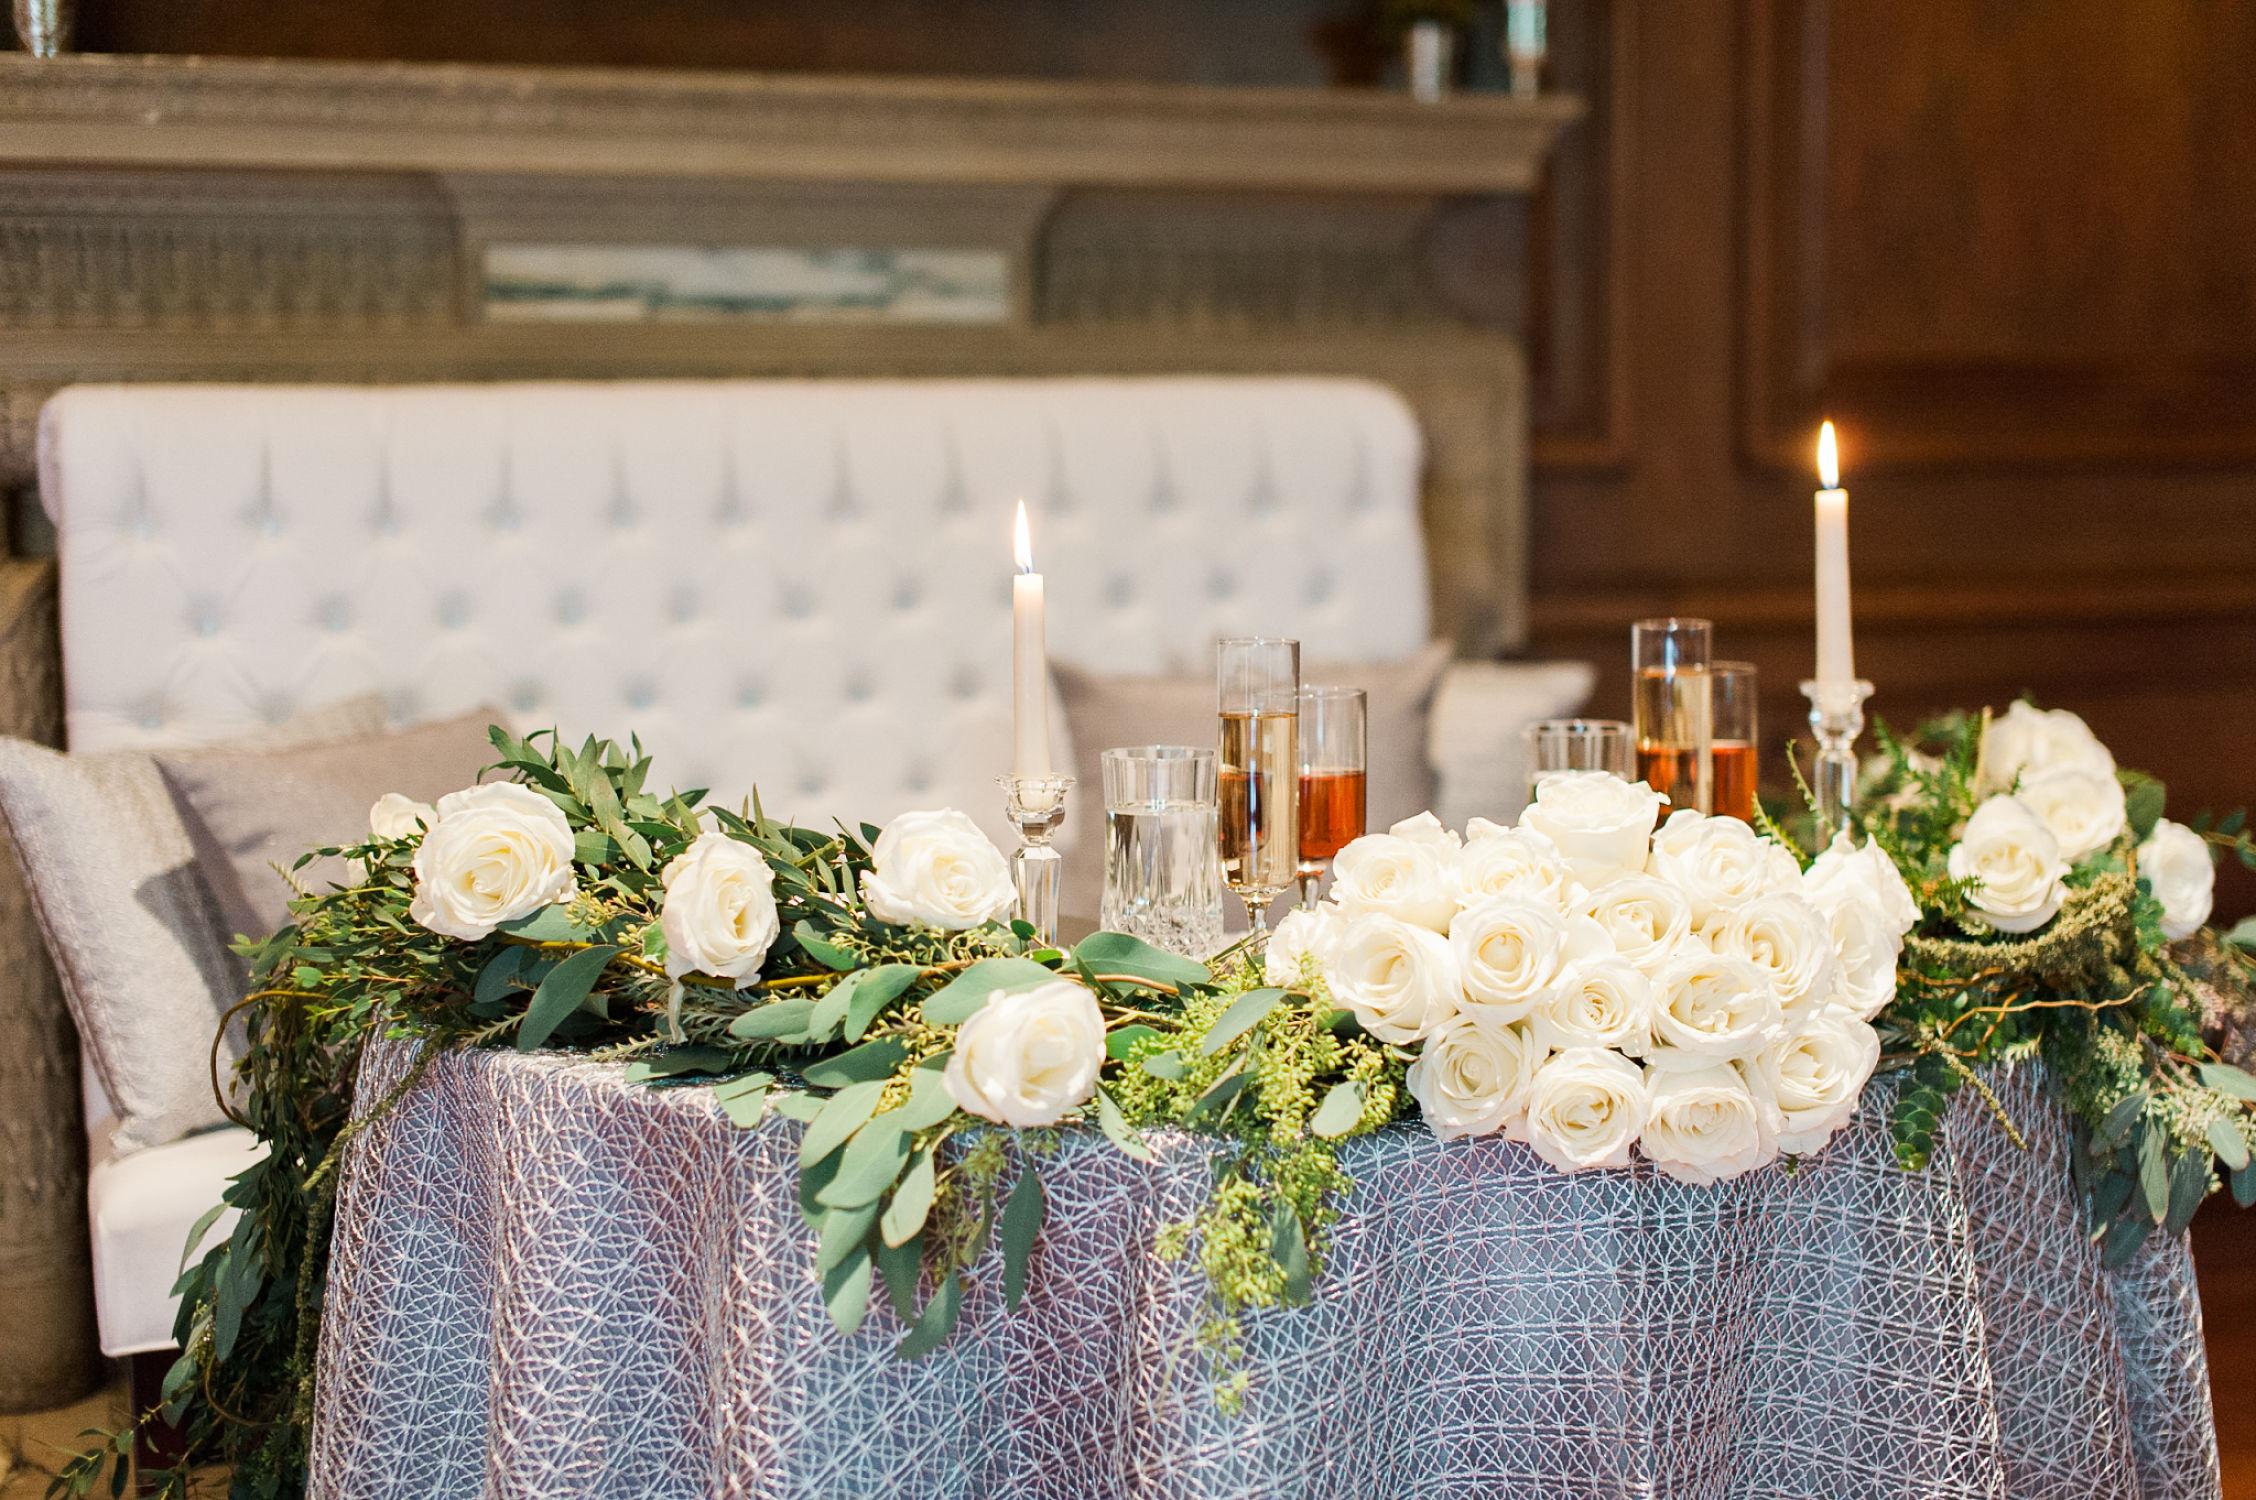 winter-glitz-wedding-inspiration-dane-estate-daylynn-designs24.jpg